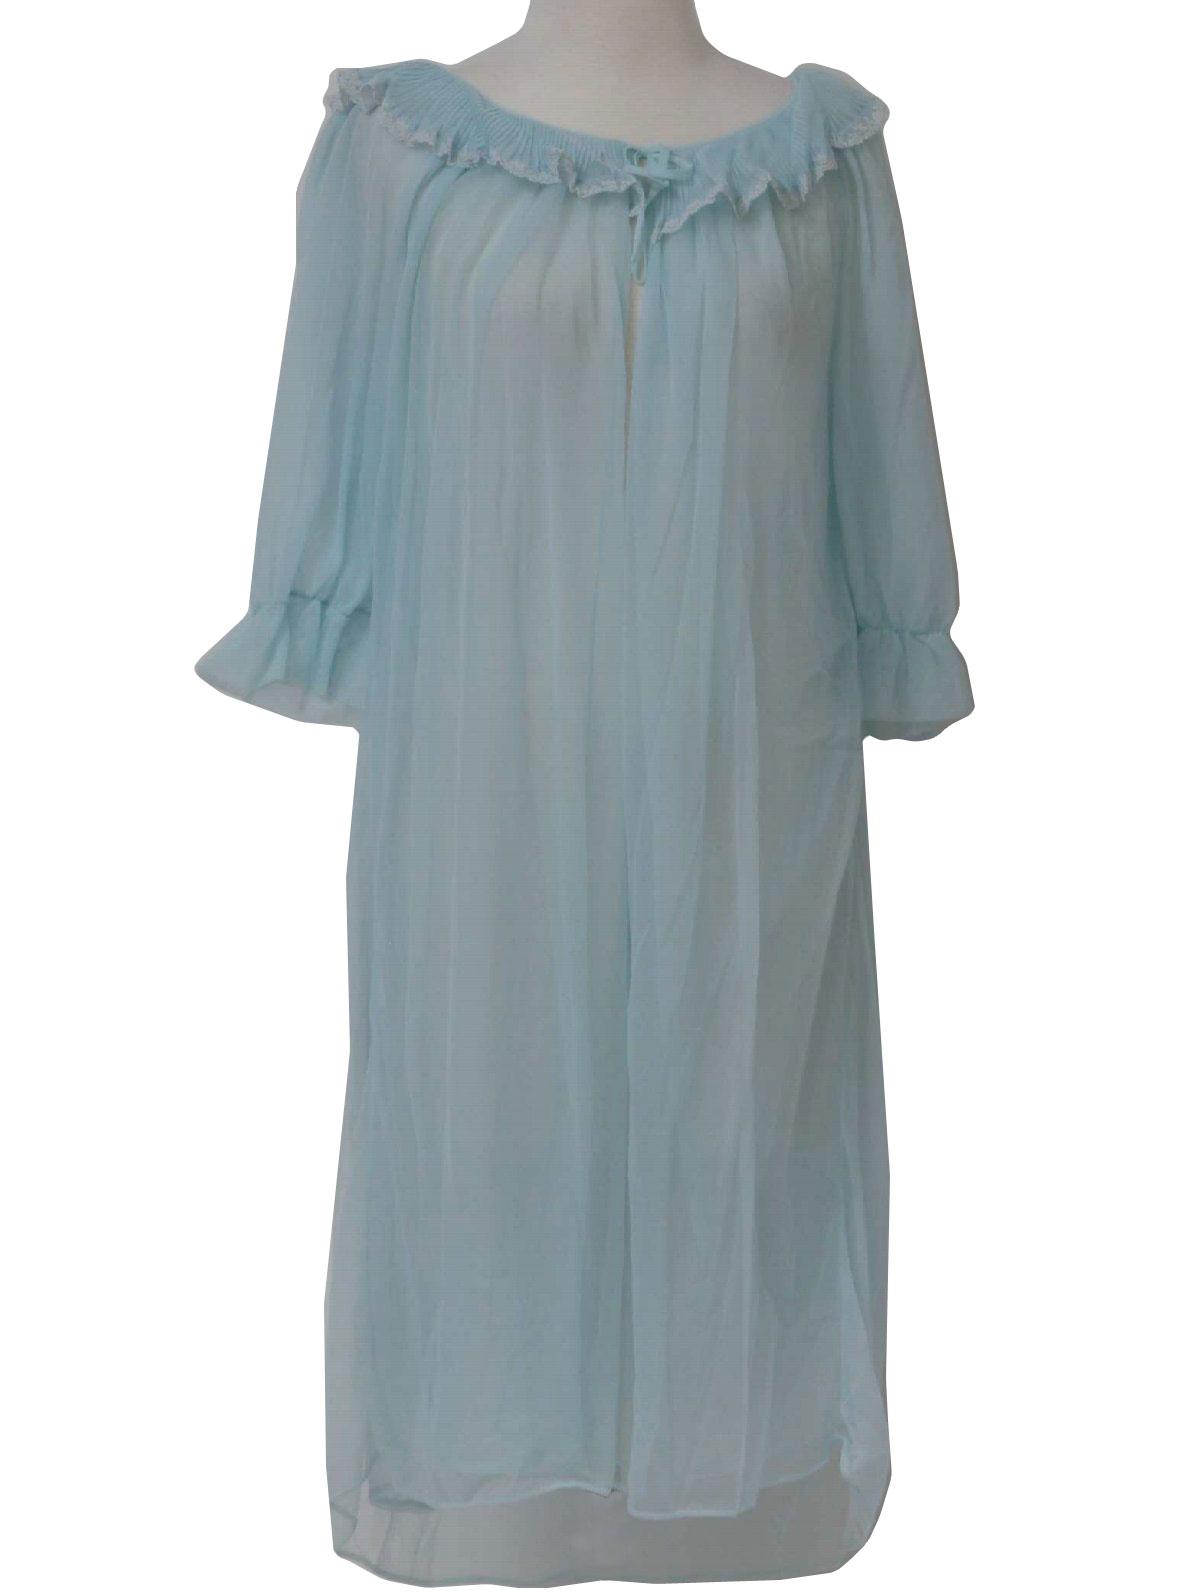 b63d517be2 Vintage 1960 s Womens Lingerie Nightgown  60s -Deena- Womens light ...